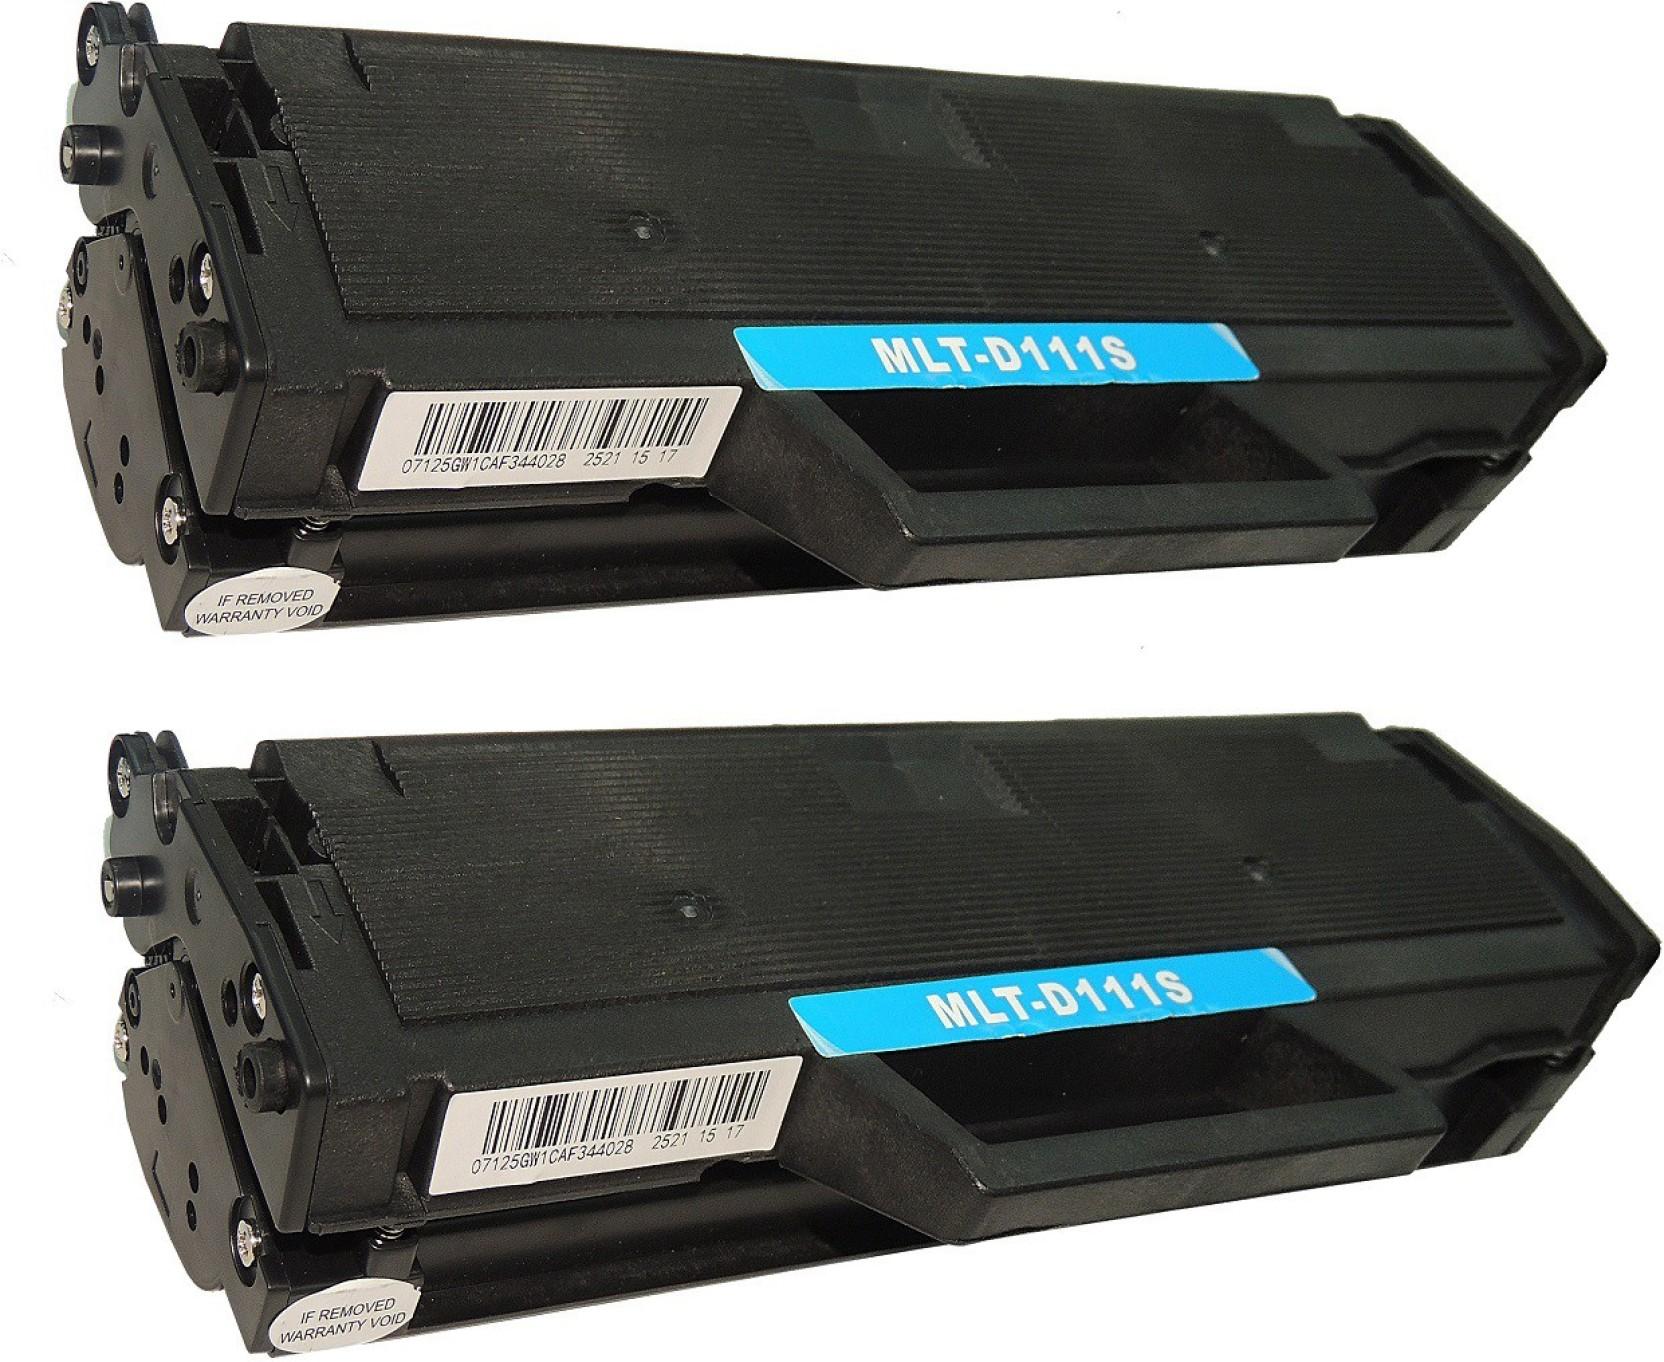 Best Home Inkjet Printers 2020 Best 4U  111S/ MLT D111S(Pack of 2) Laserjet Toner cartridge for